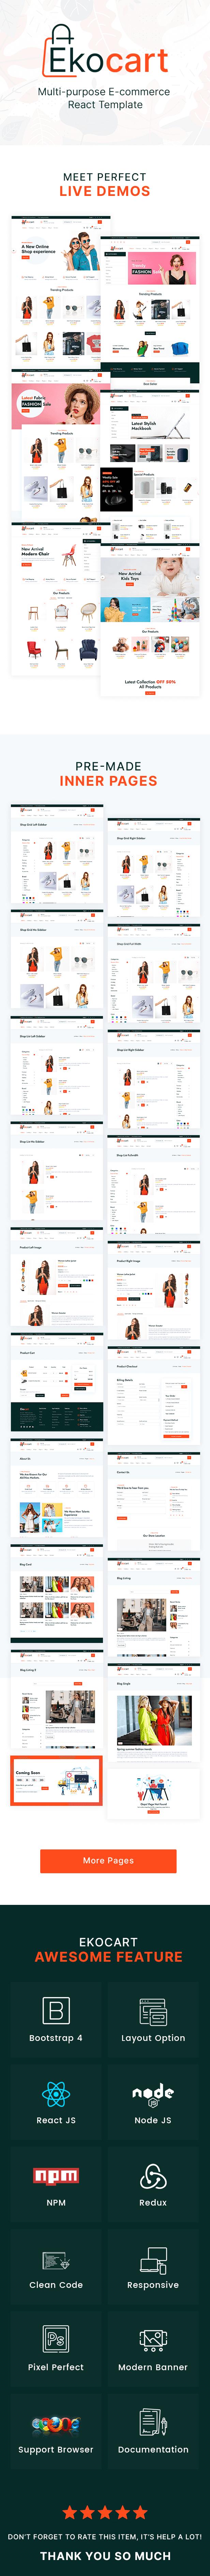 Ekocart- Multi-purpose E-commerce React Template - 1